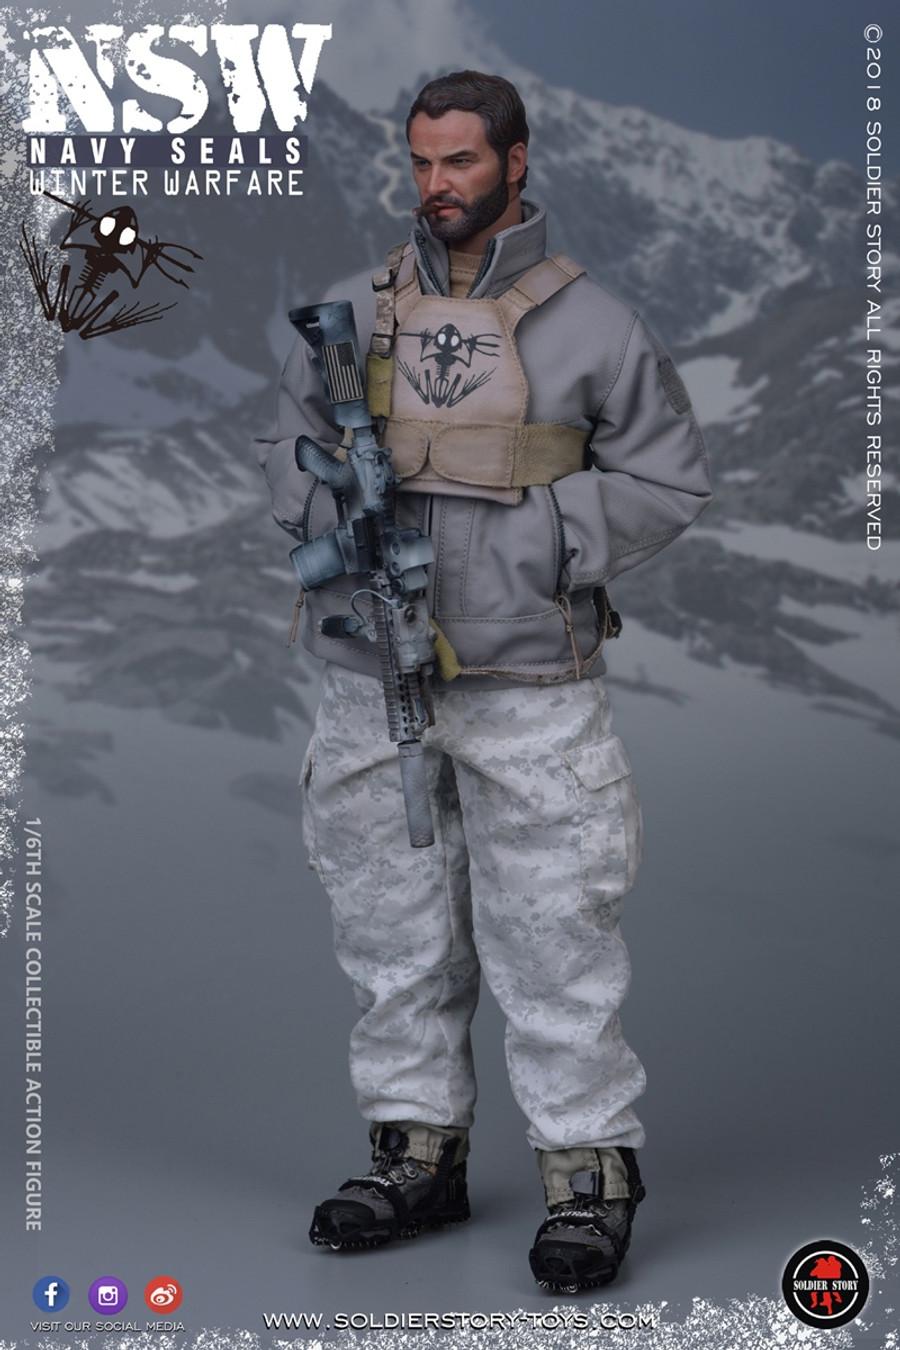 "Soldier Story - NSW Winter Warfare ""Marksman"""